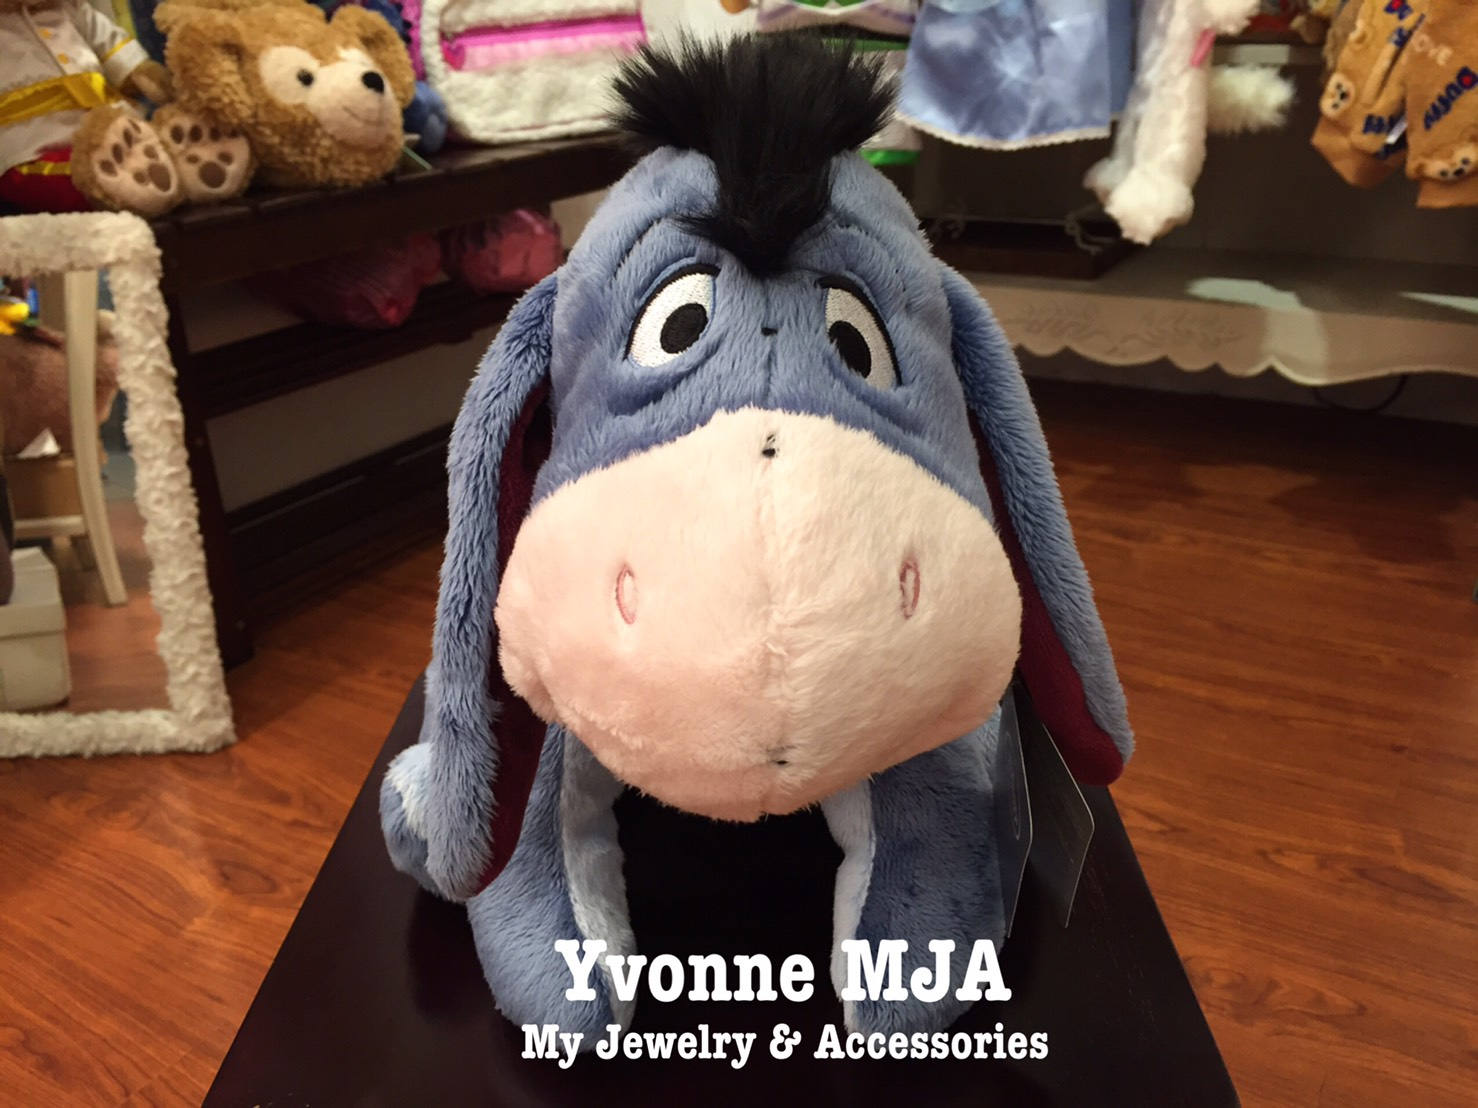 *Yvonne MJA英國代購*英國迪士尼Disney 商店限定正品 Eeyore驢子娃娃